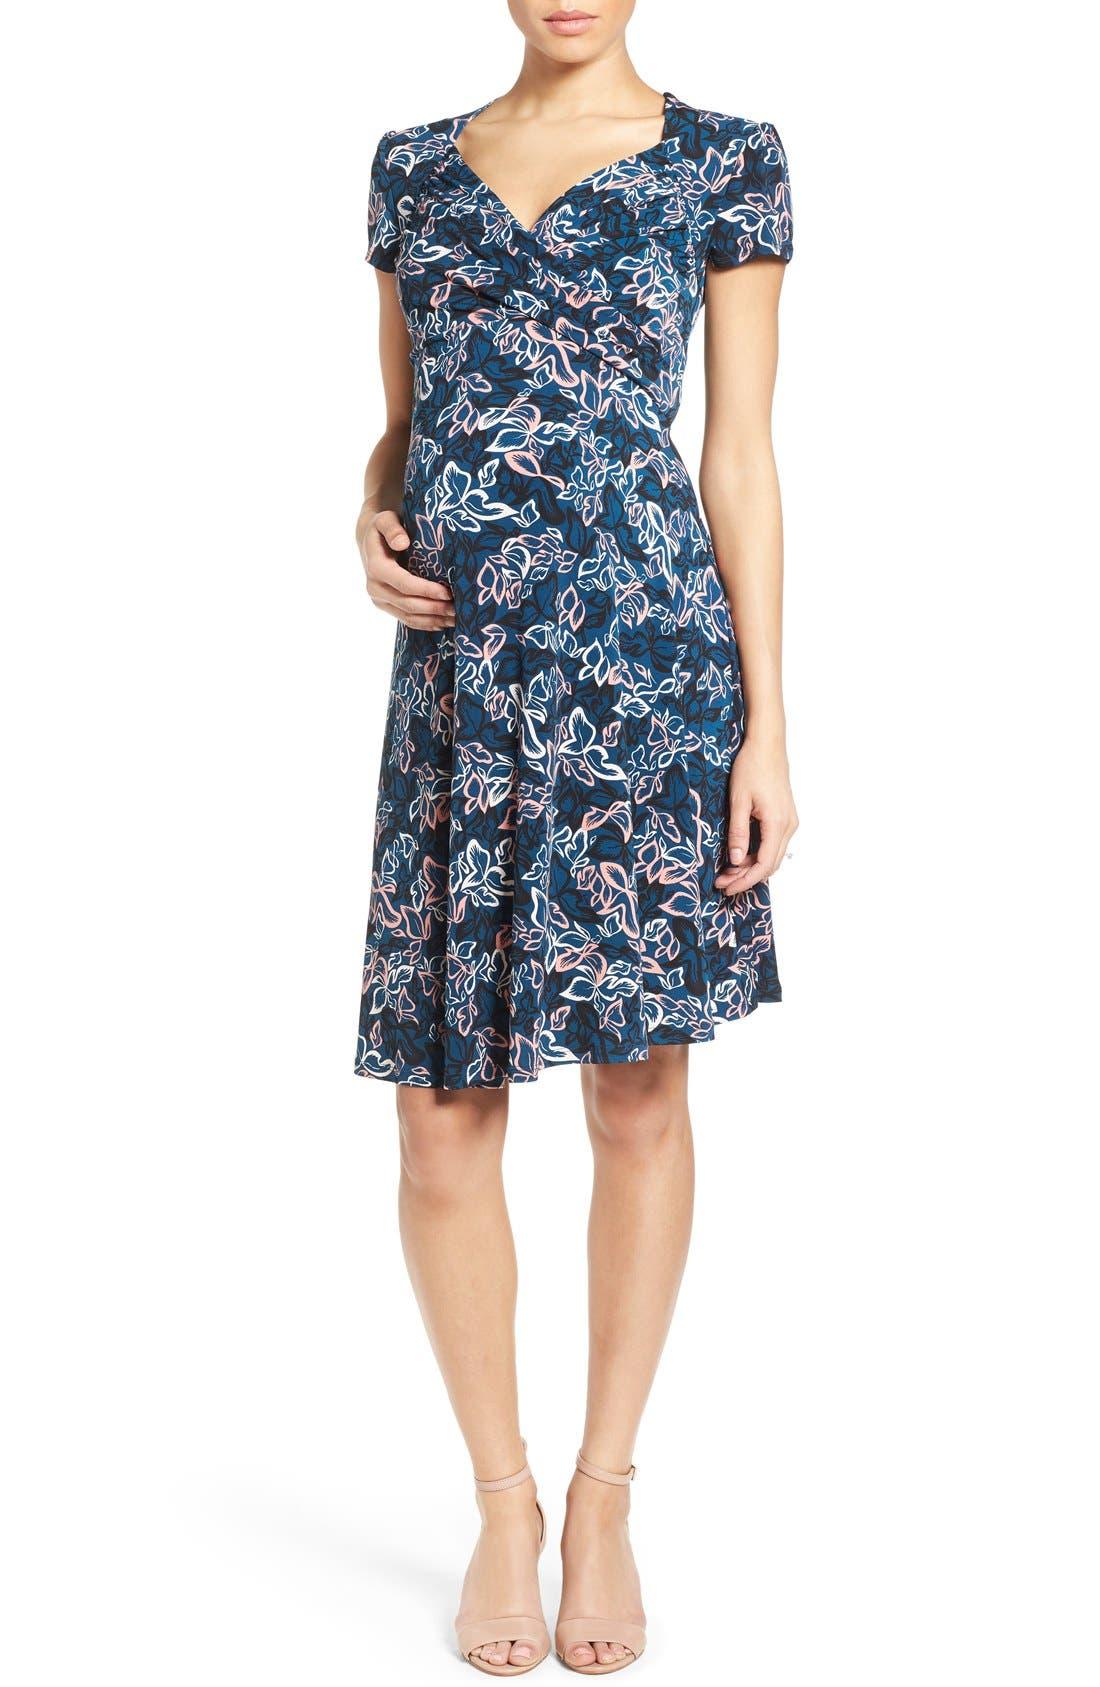 'Sweetheart' Maternity Dress,                         Main,                         color, 405